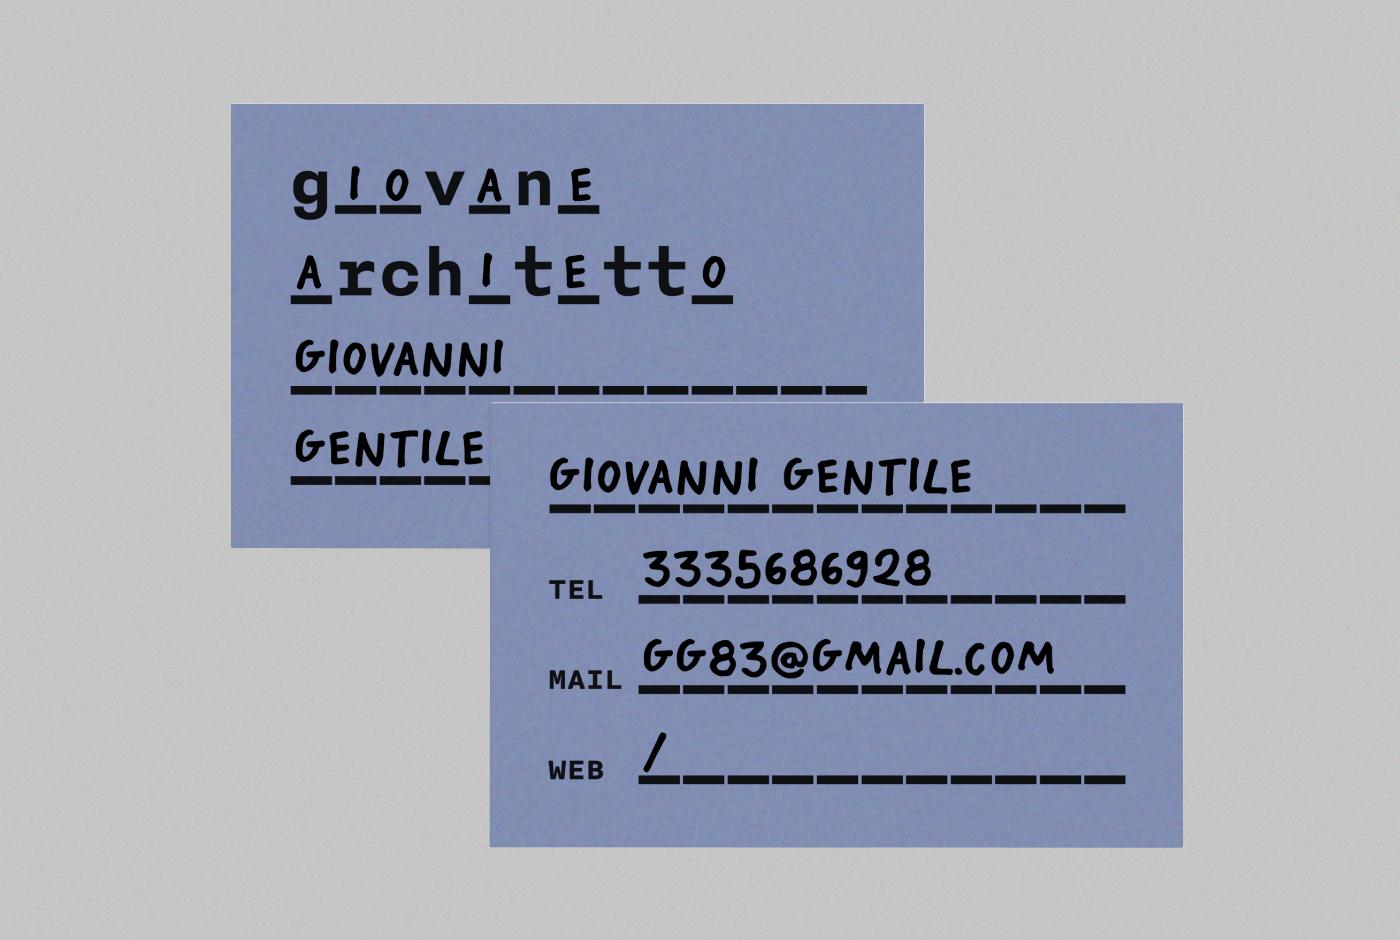 Giovani Architetti (Young Architects) Identity